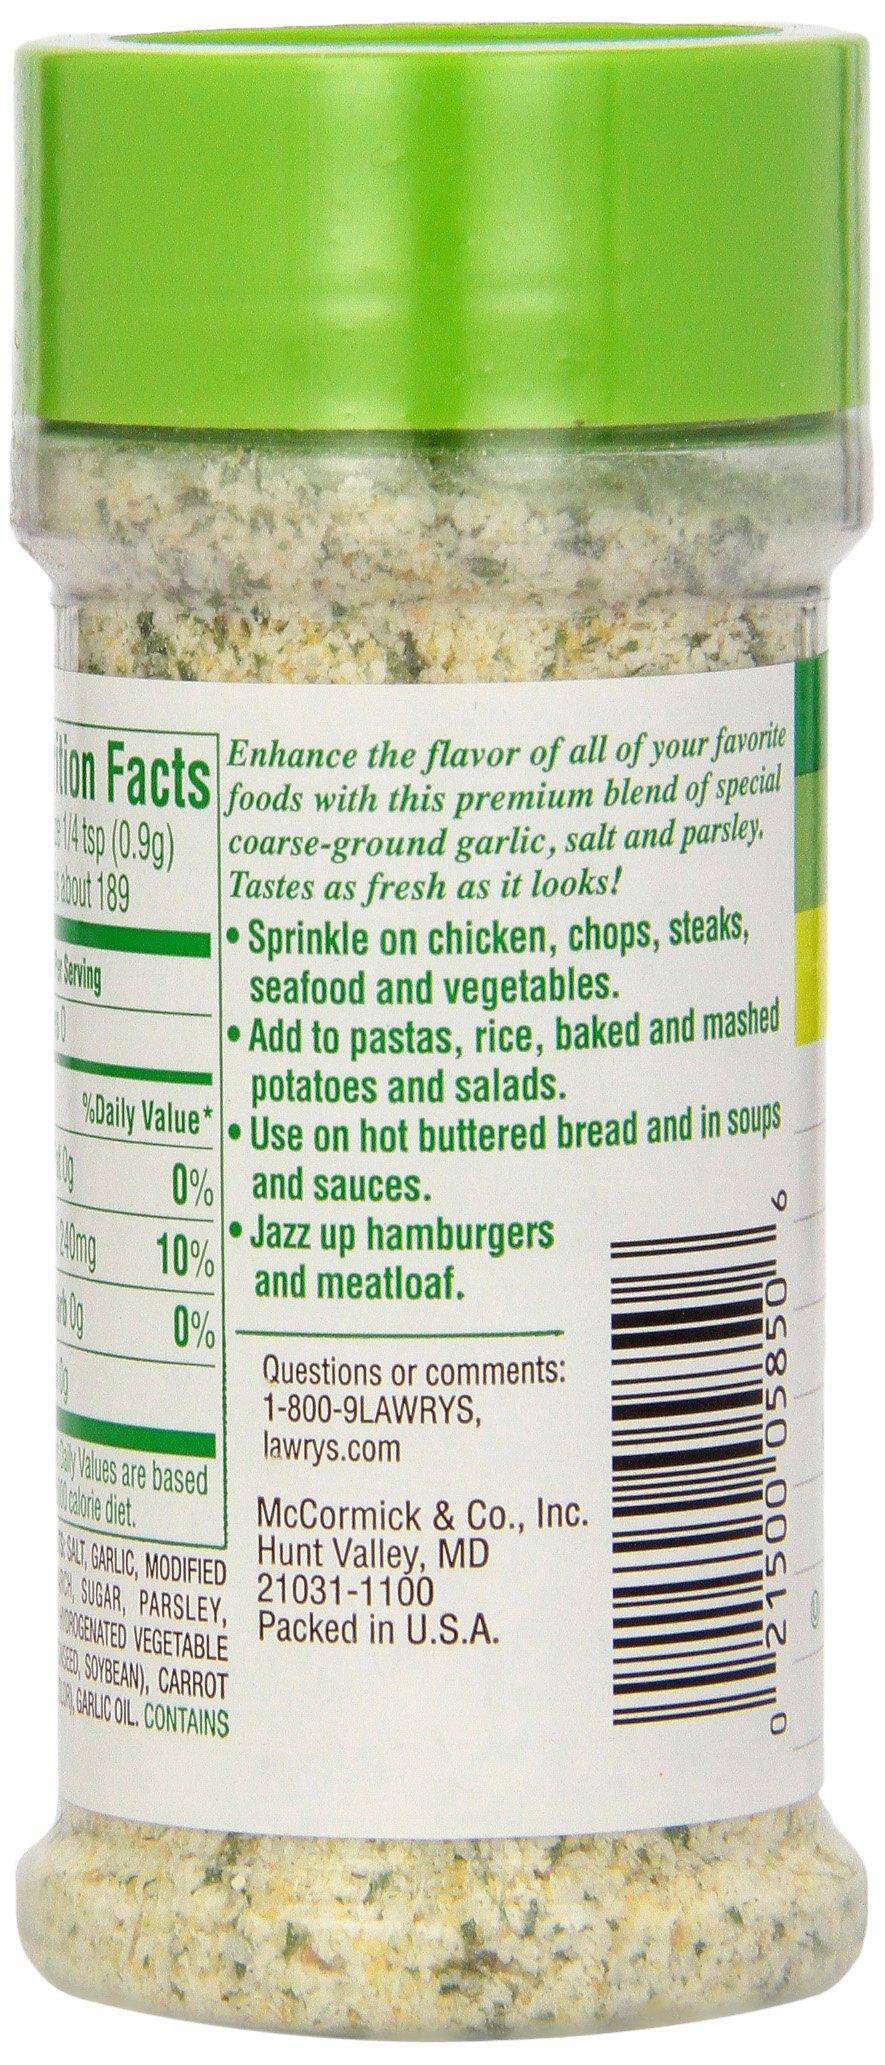 Lawry's Garlic Salt, 5.6 oz